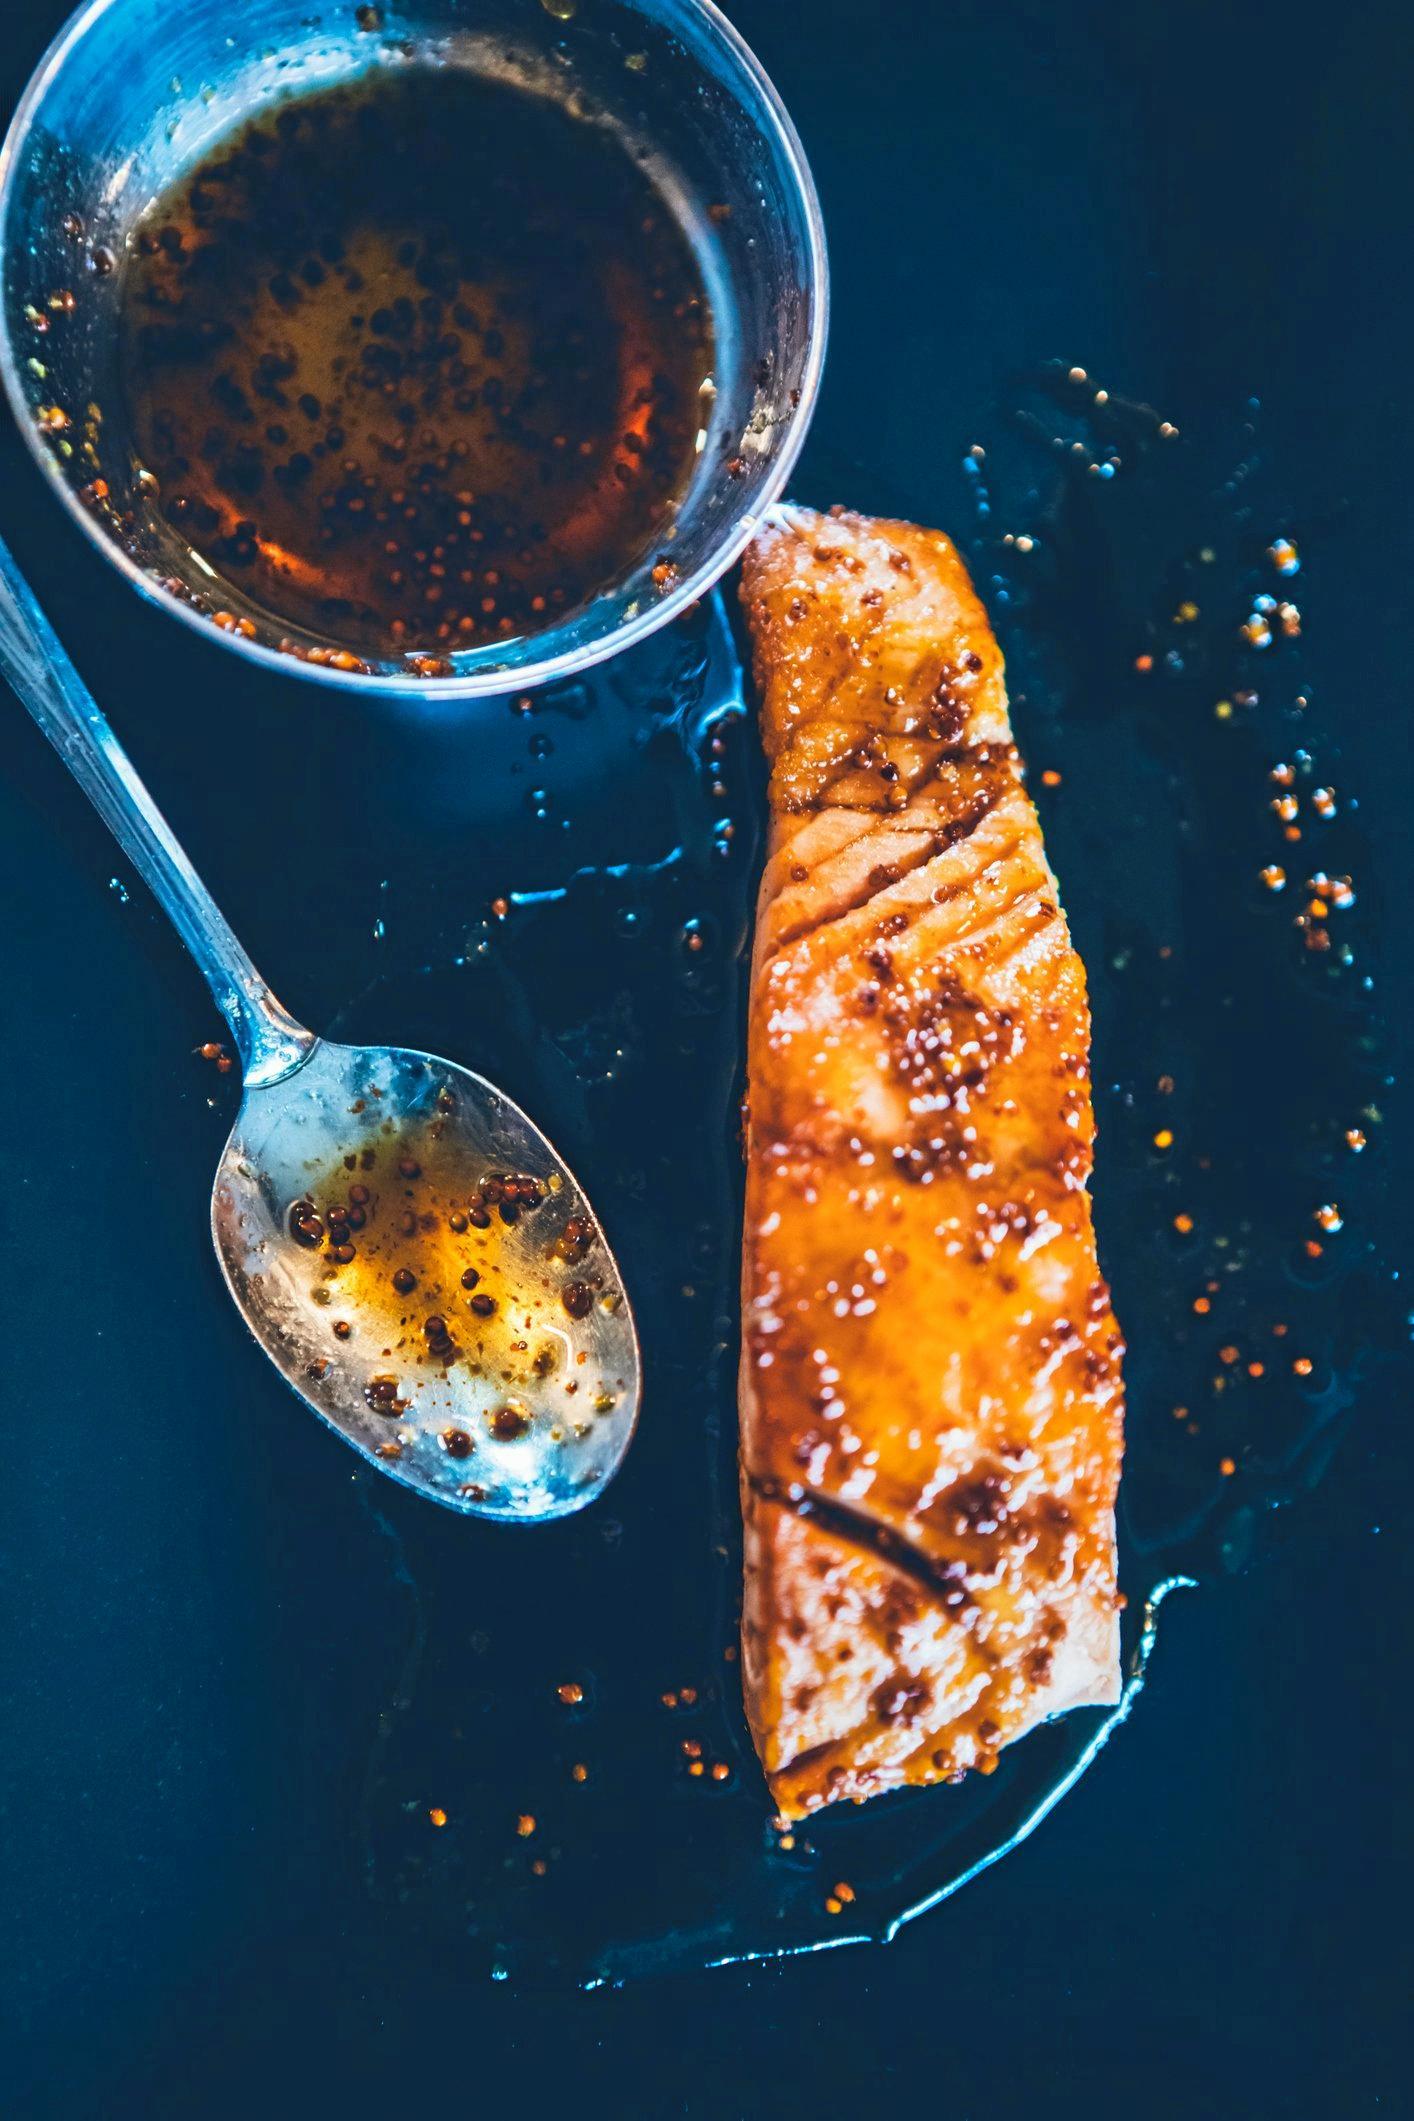 Preparing honey mustard lacquered salmon fillet.